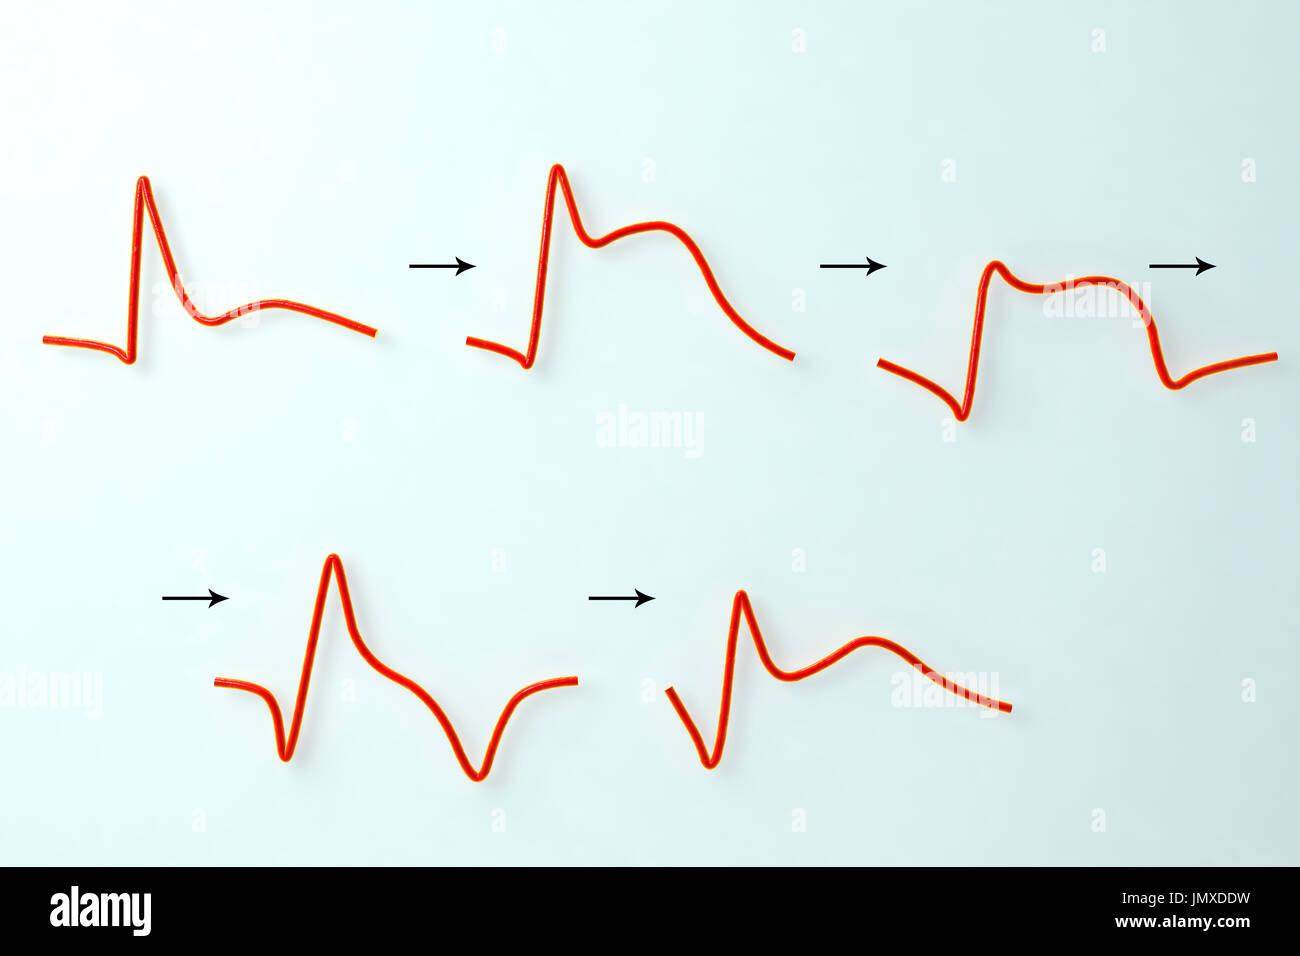 Evolution of an electrocardiogram (ECG) during a myocardial